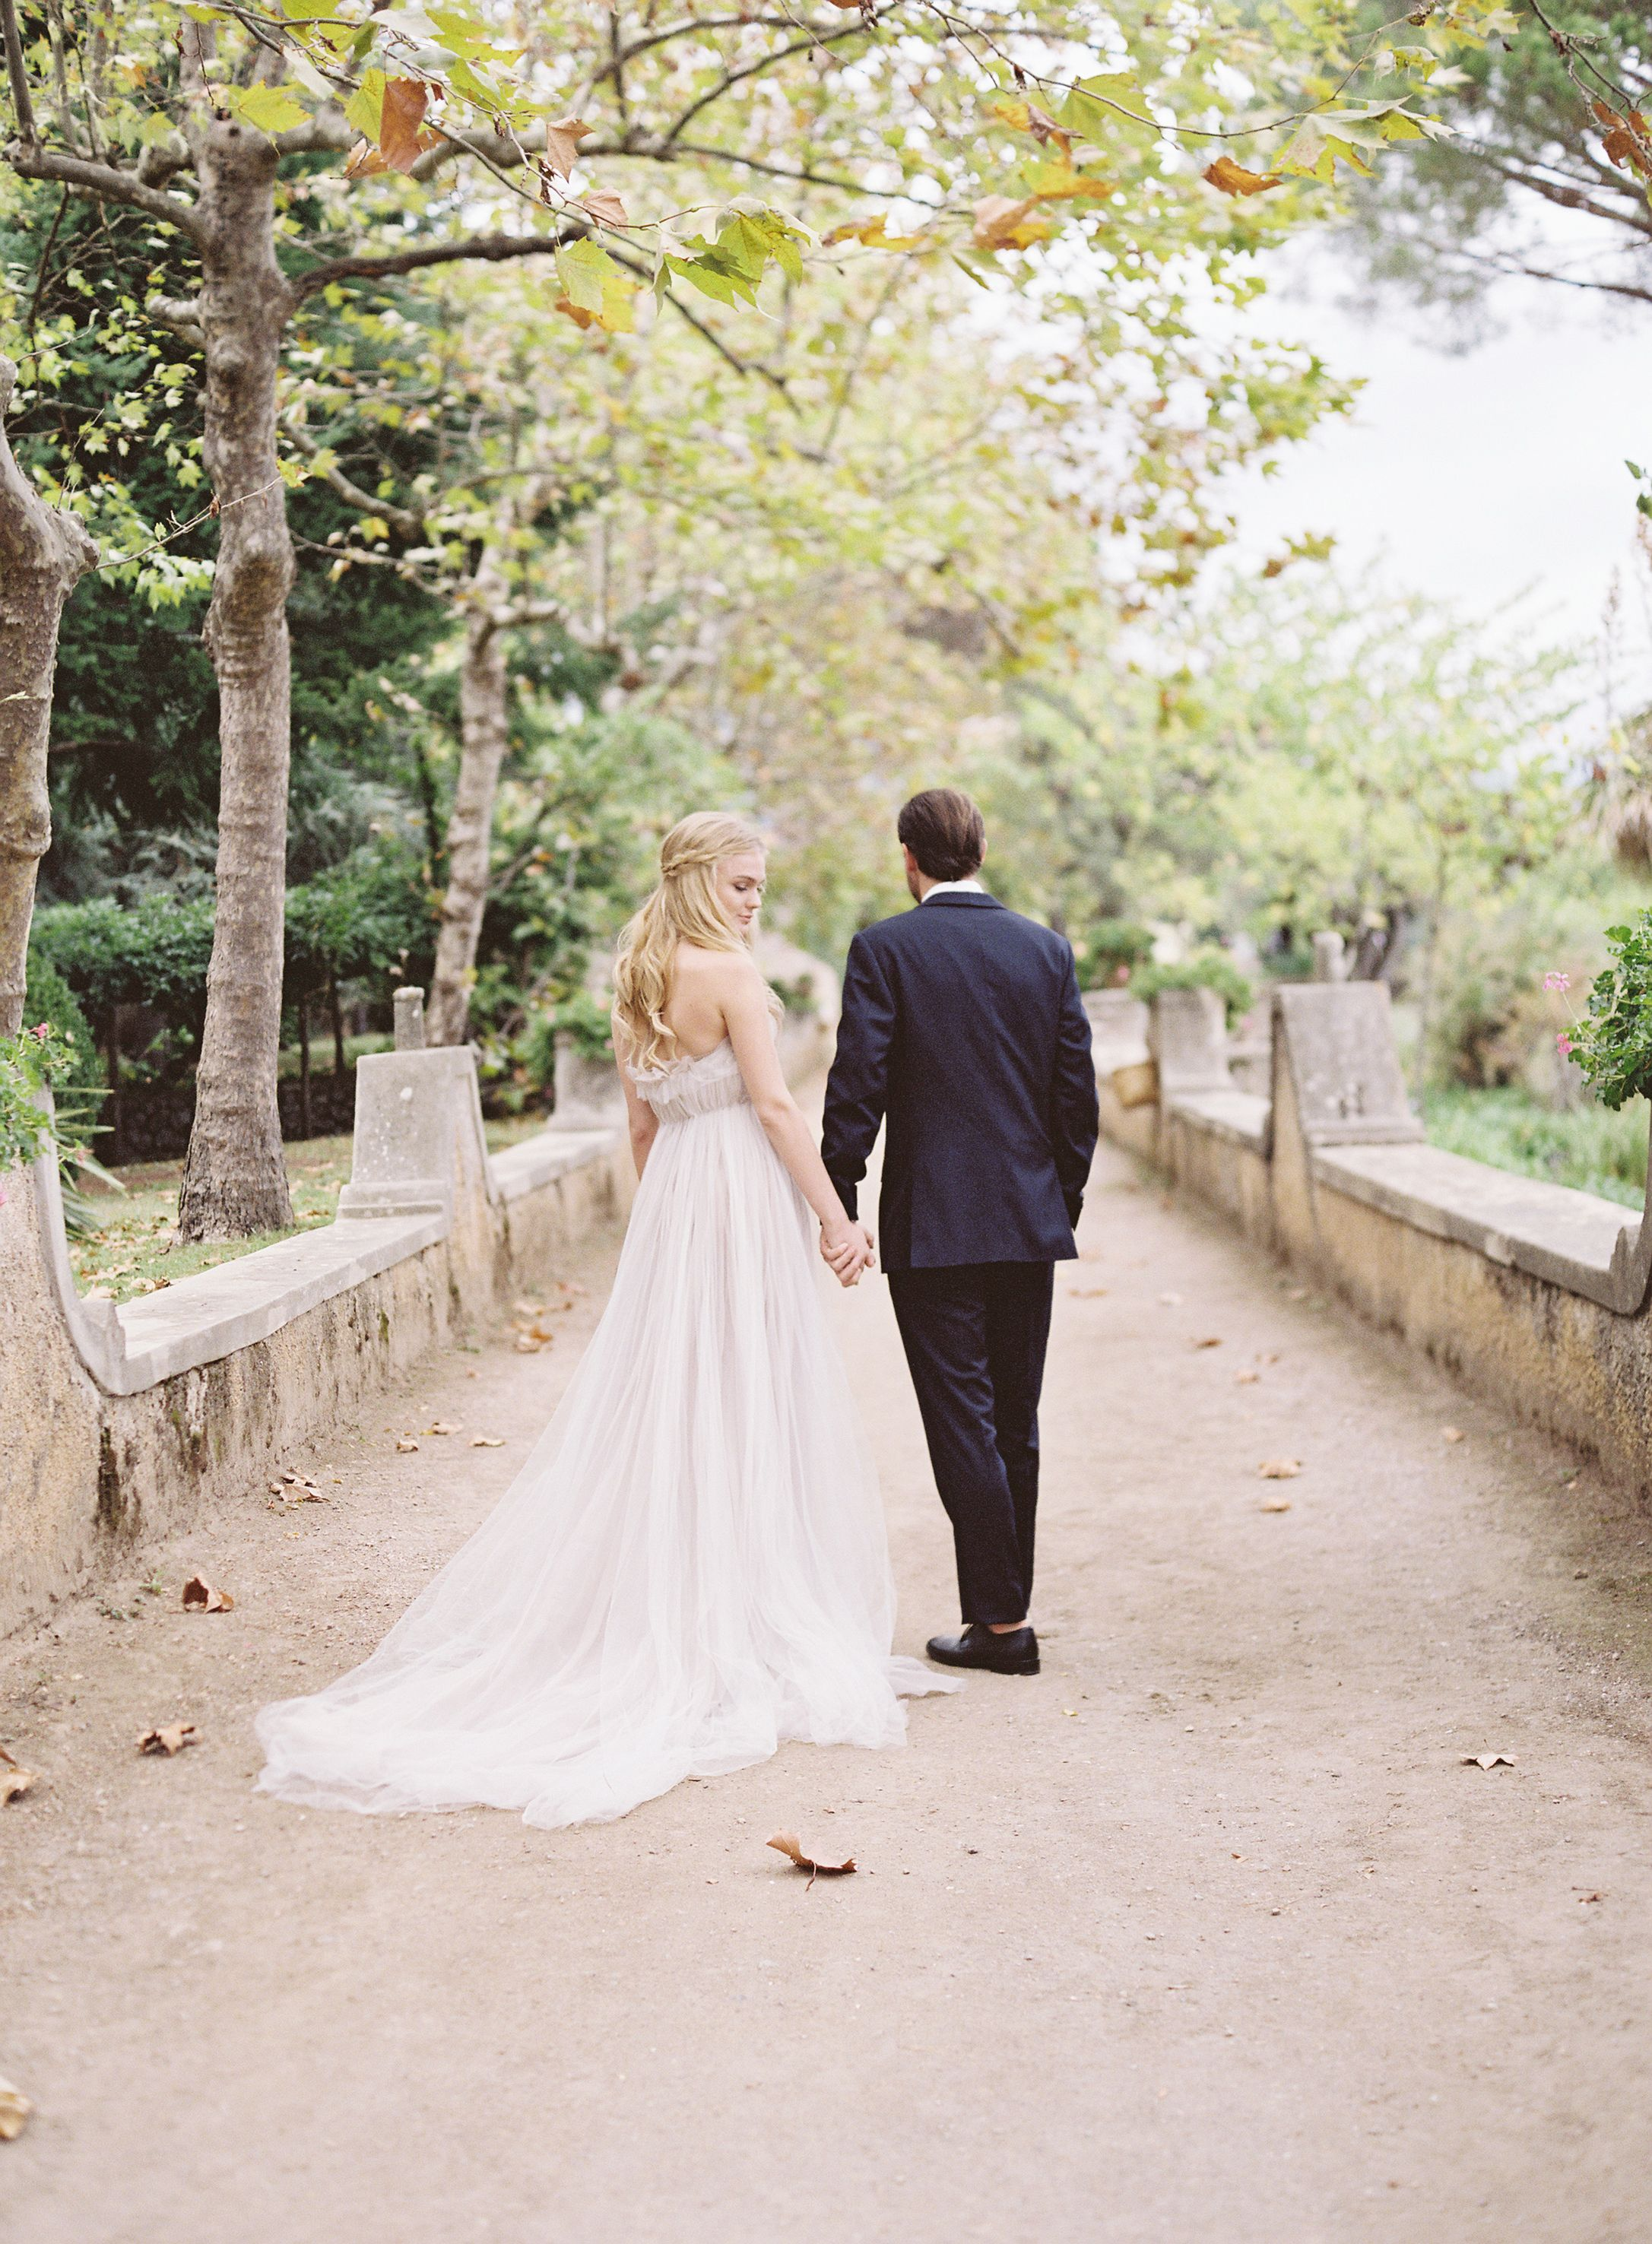 Wedding photography in Amalfi coast,Italy.